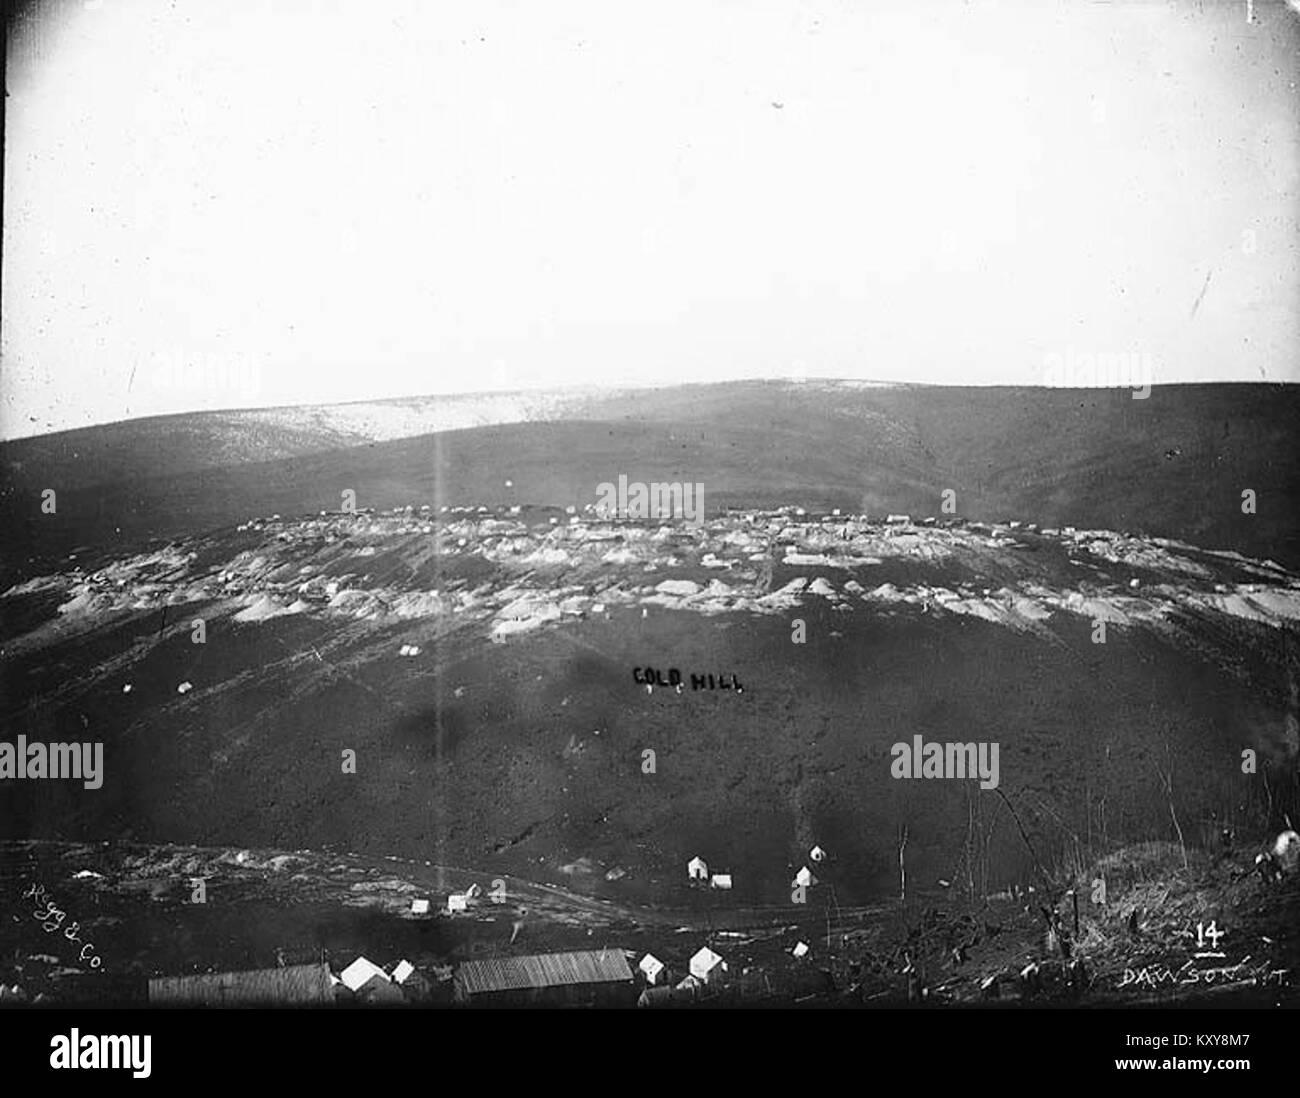 Gold Hill mining operations Yukon Territory, ca 1898 (HEGG 197) - Stock Image